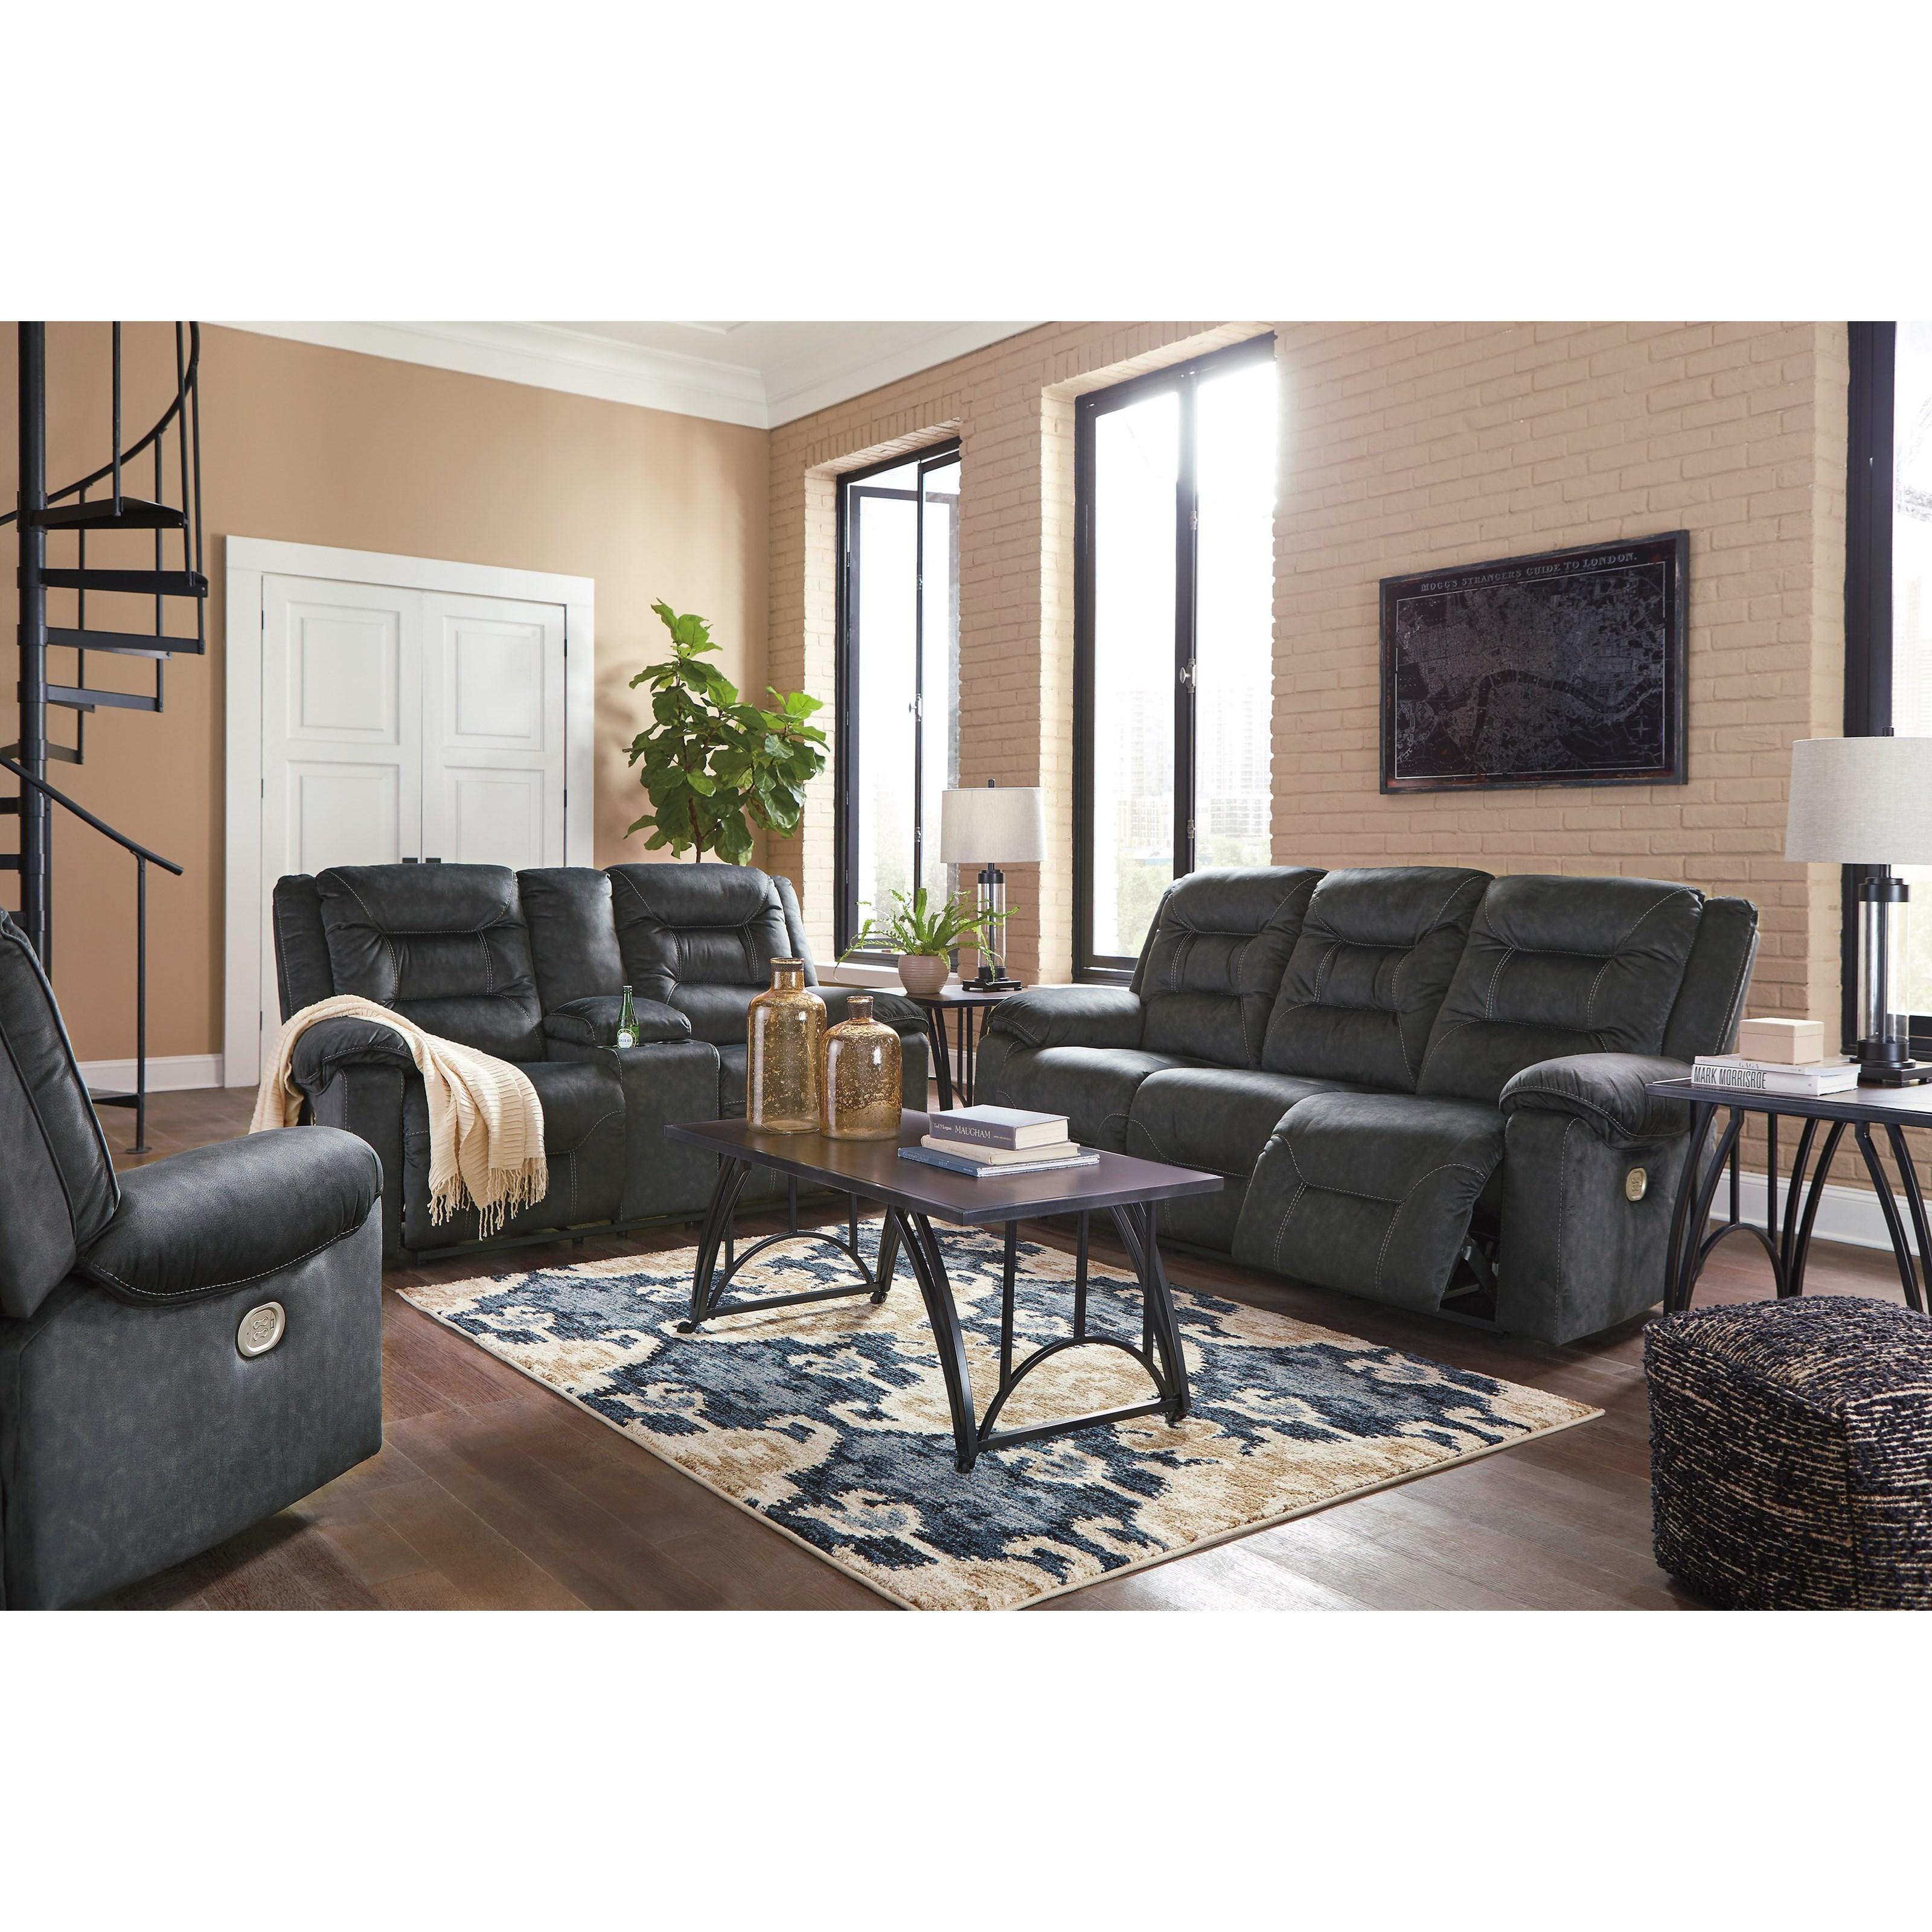 Styleline Waldheim Reclining Living Room Group Efo Furniture Outlet Reclining Living Room Groups